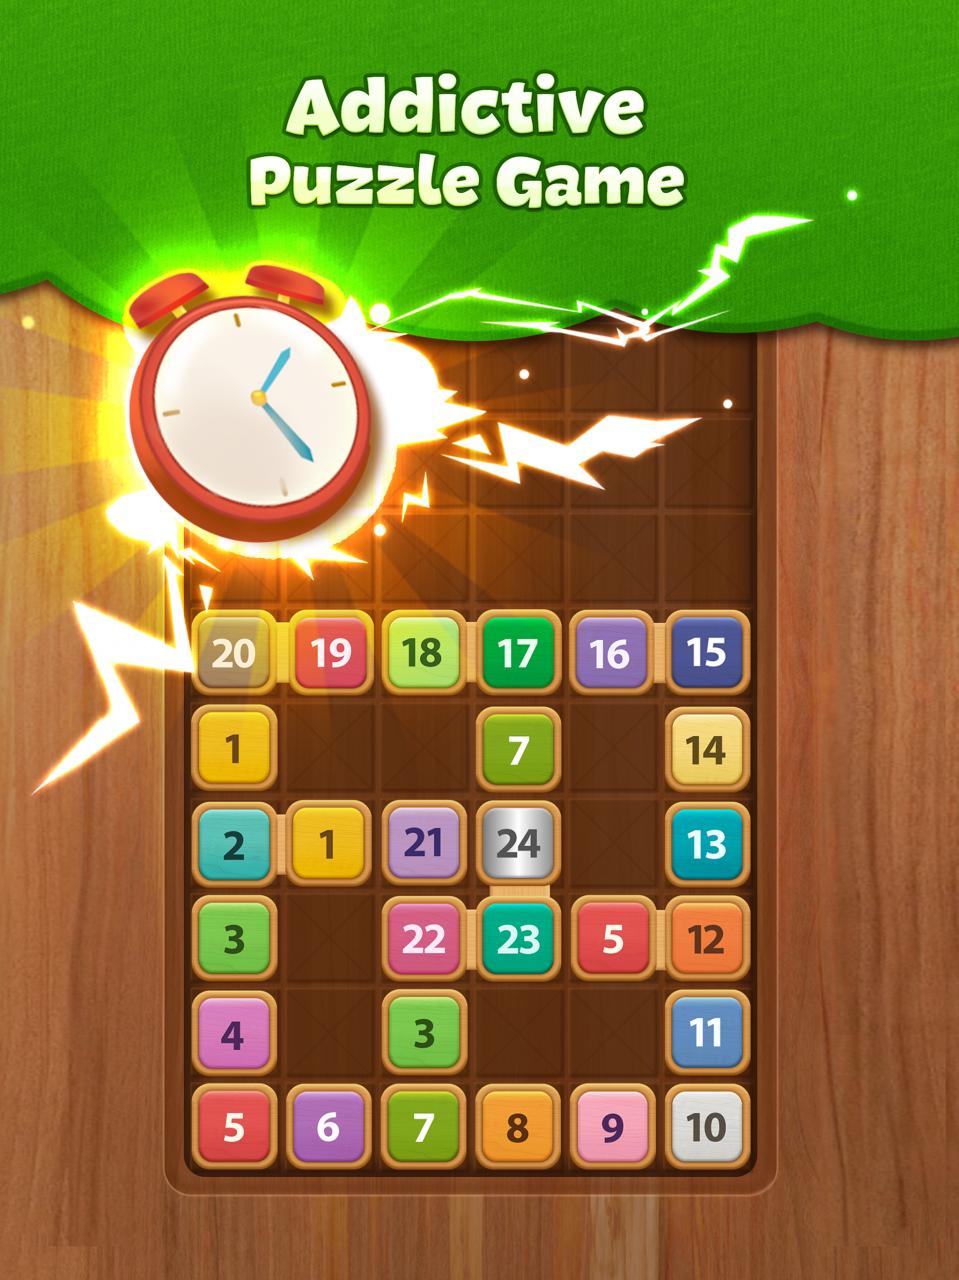 MergeWoodBlockPuzzle好玩嗎 MergeWoodBlockPuzzle玩法簡介